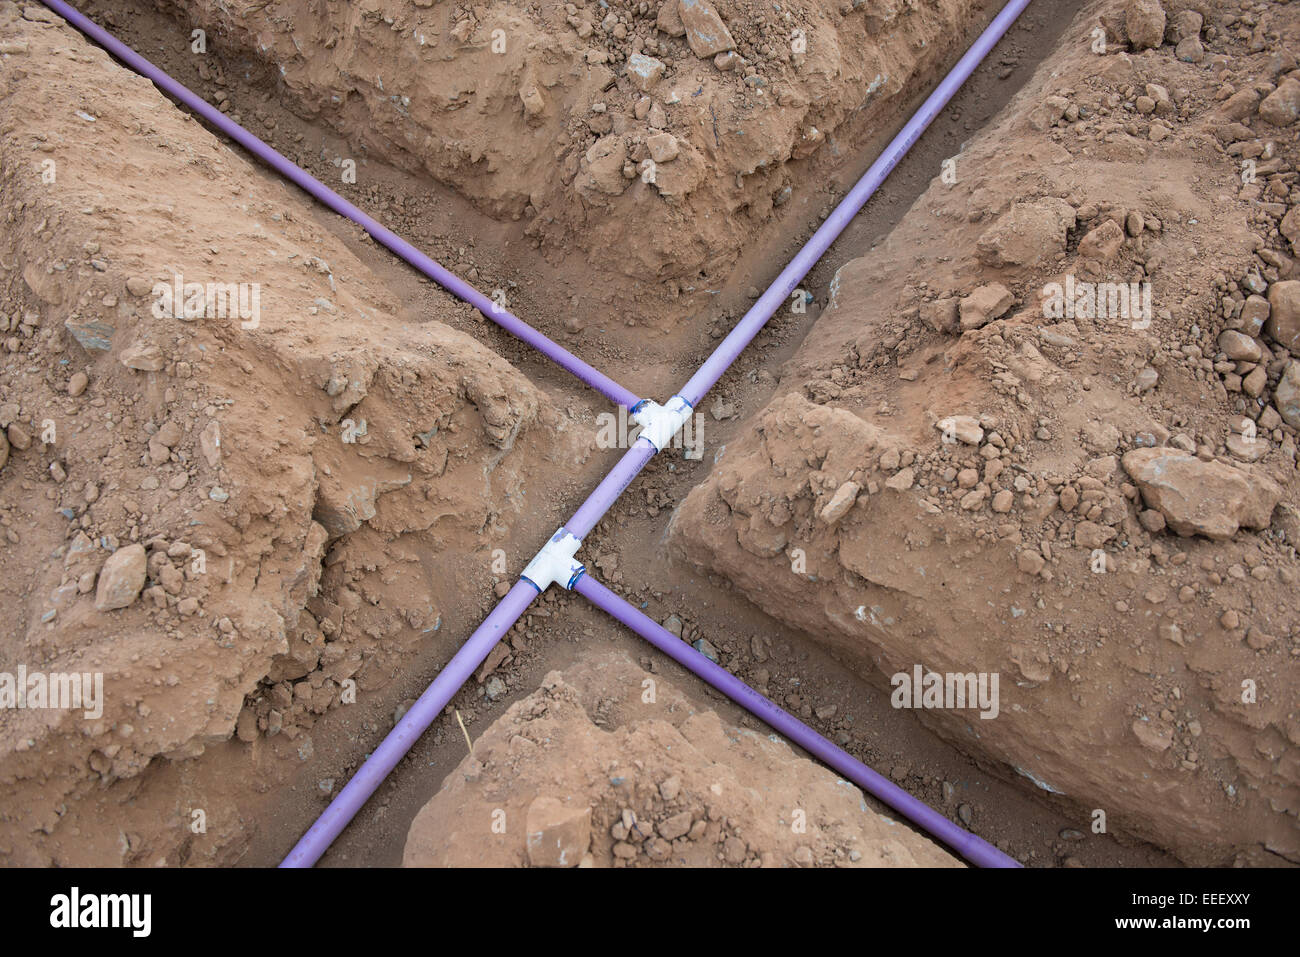 Pipe For Underground Sprinkler System In Open Dirt